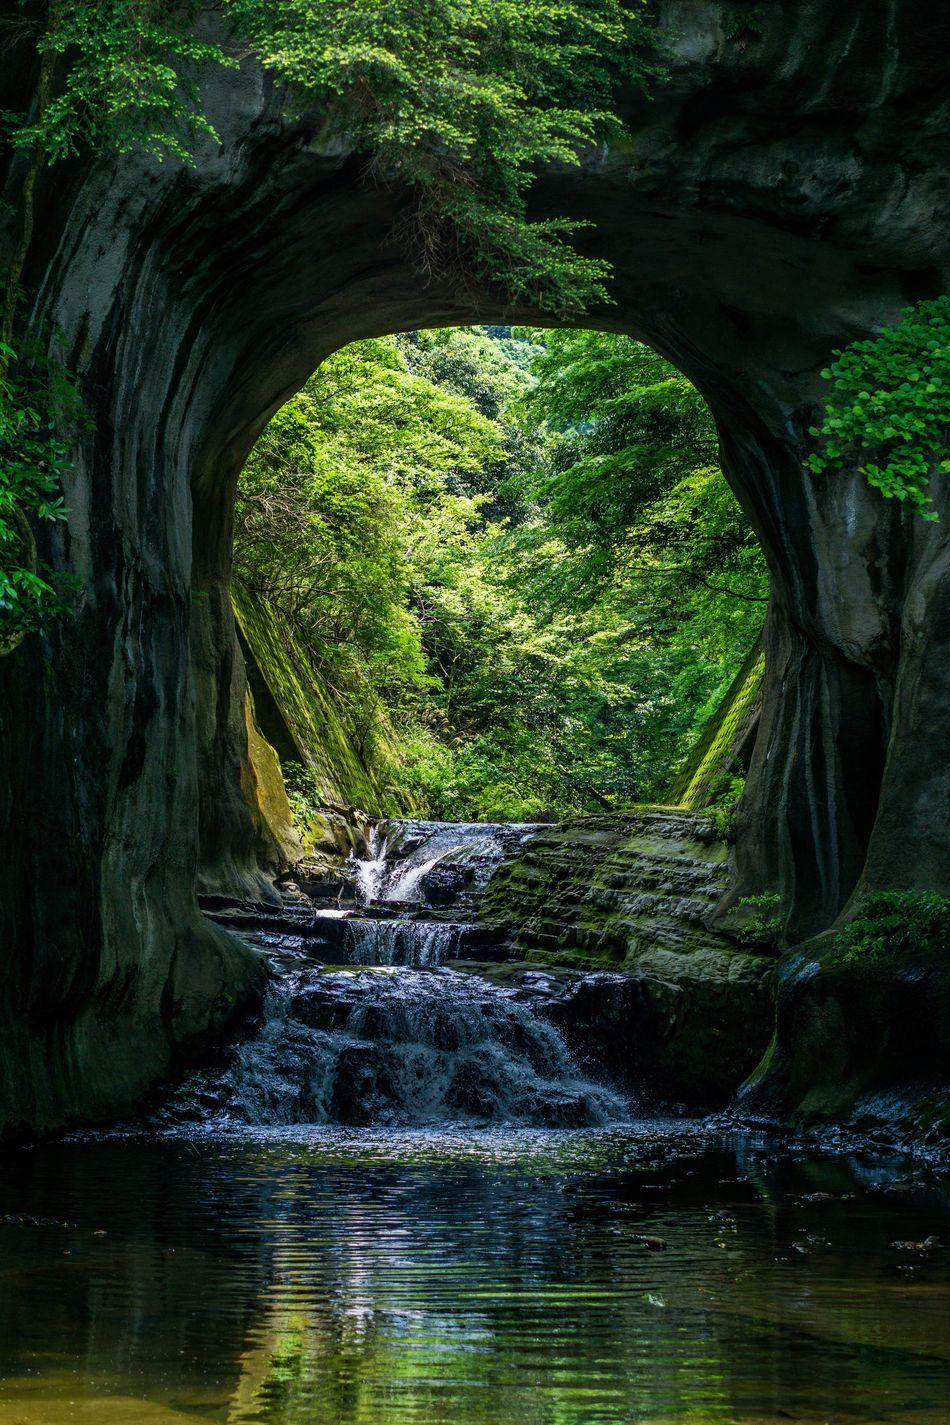 Japan Chiba Kimitsu Waterfall Nomizo_falls Nature Nomizo_waterfall Nomizo Waterfall, Kimitsu, Japan First Eyeem Photo